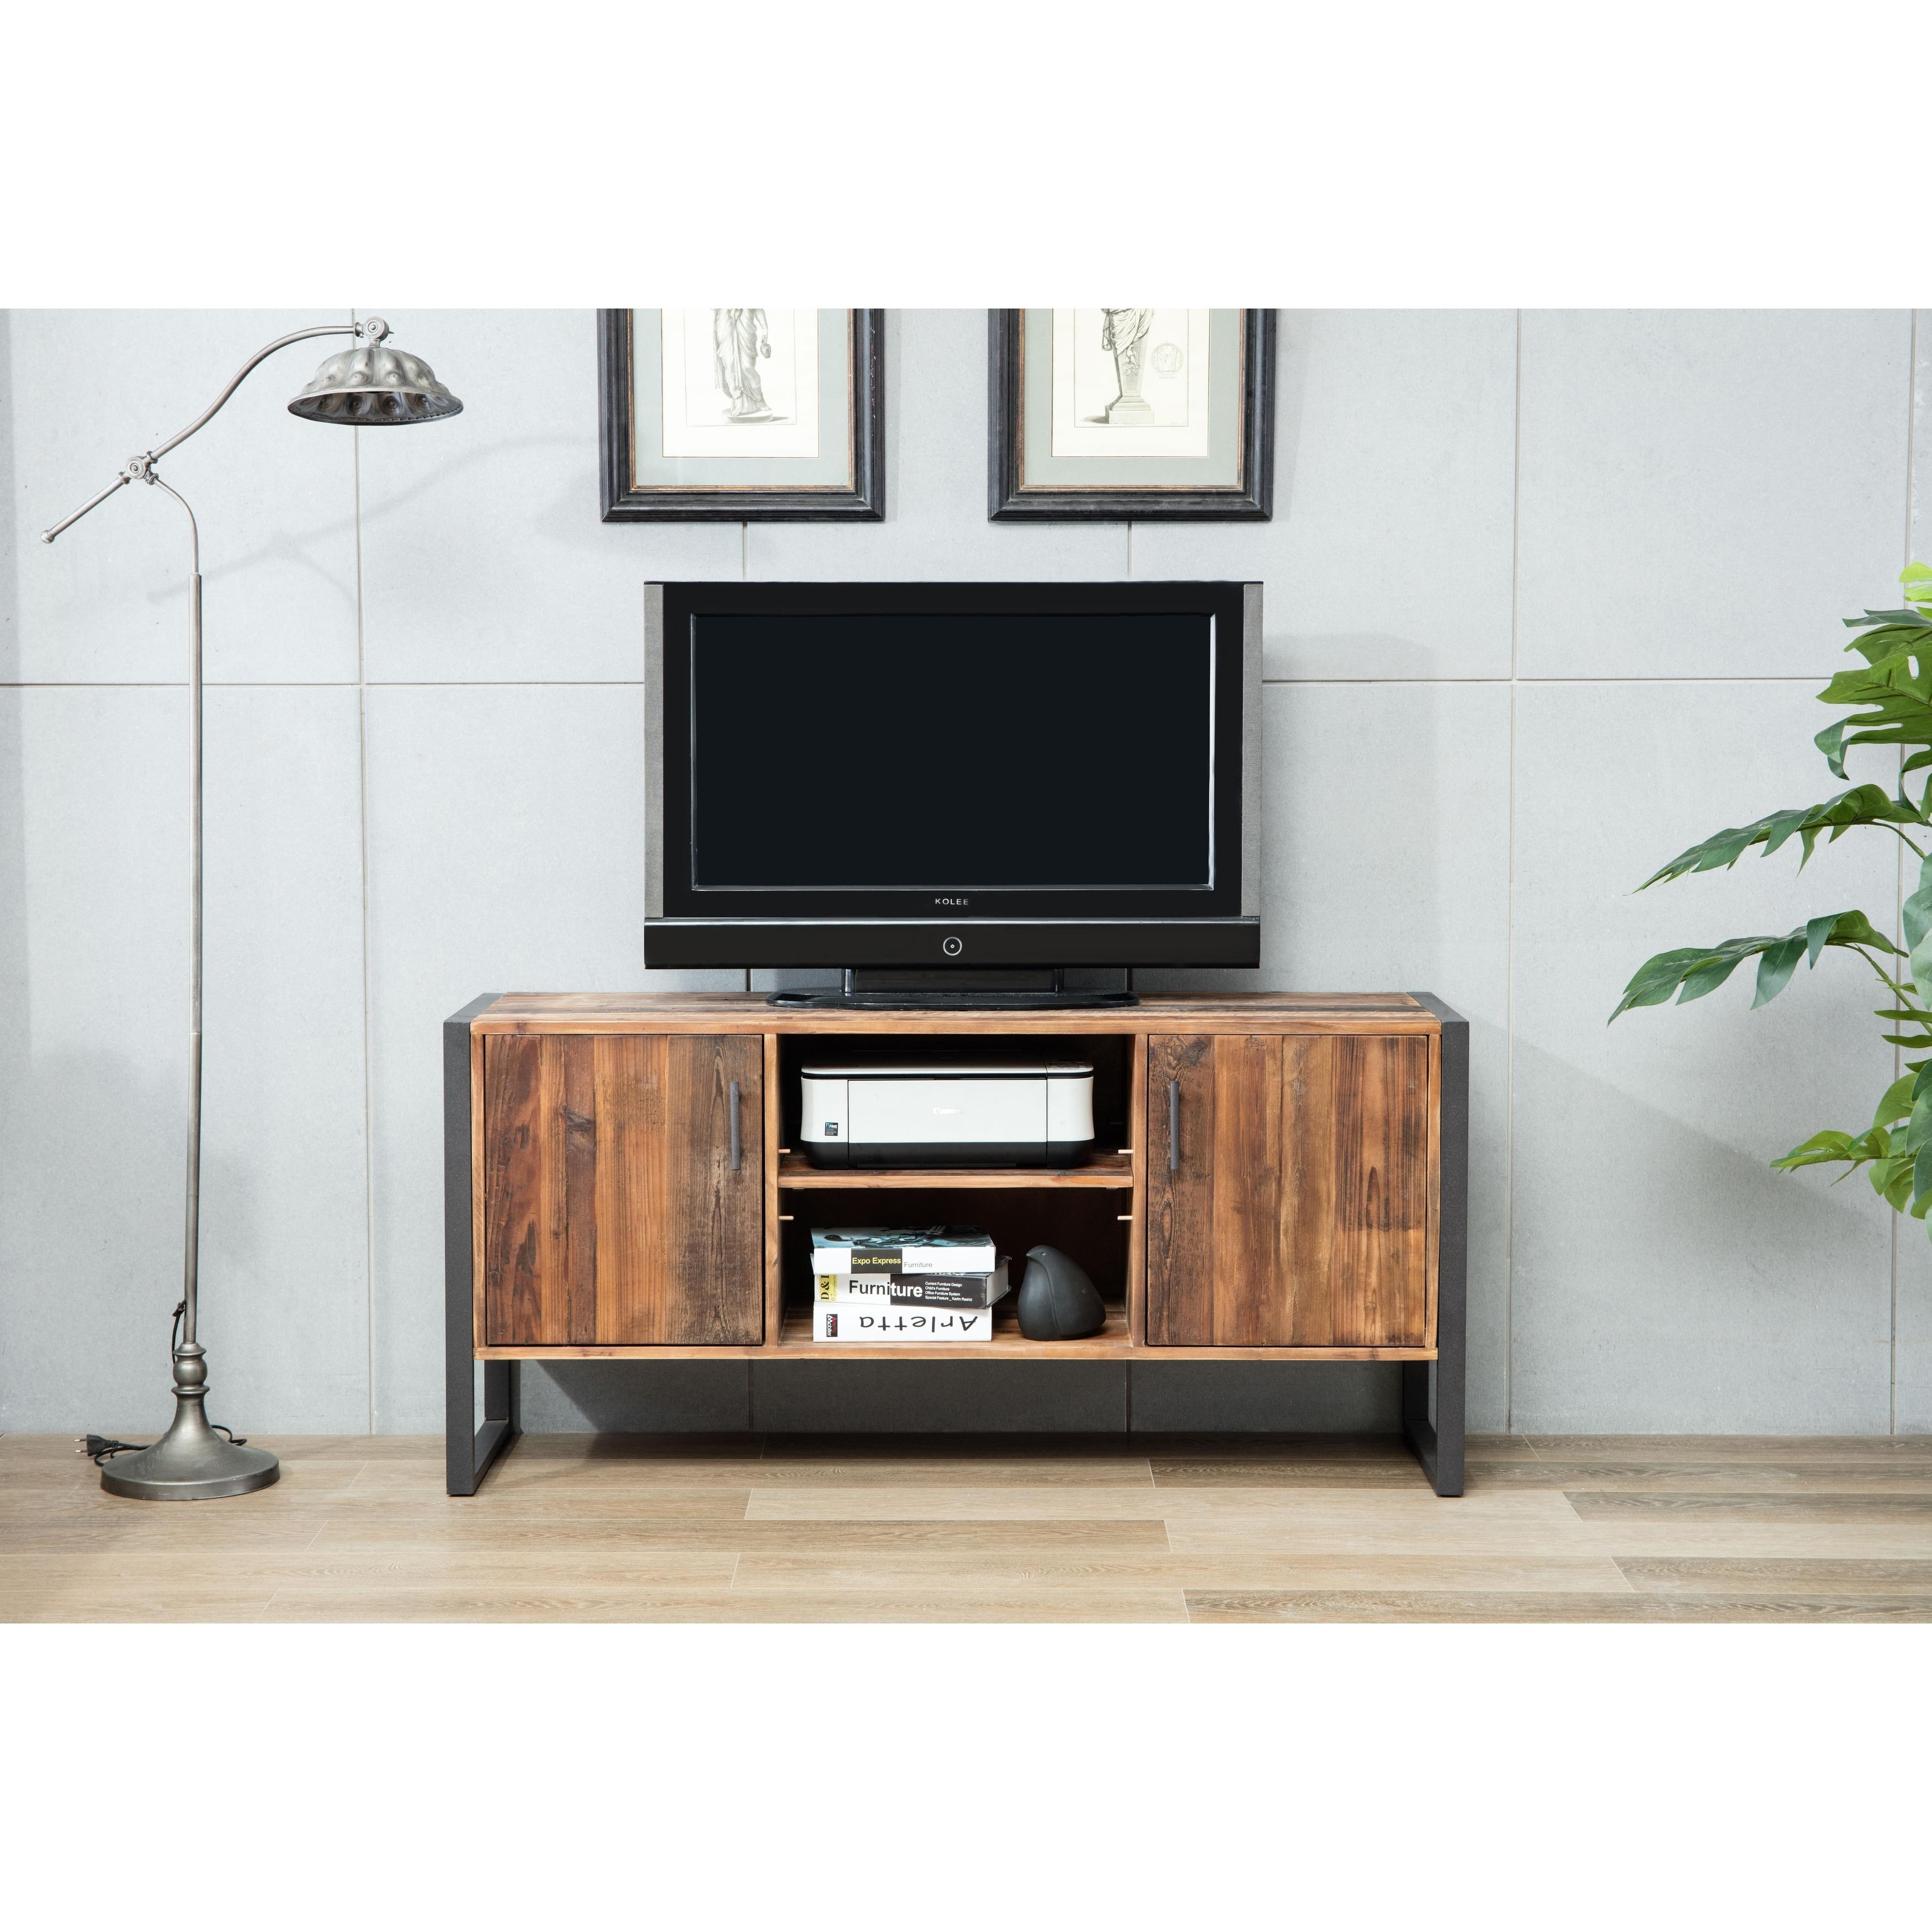 Ruffalo Urban Rustic Wood And Metal Tv Media Console 814944020525 Ebay